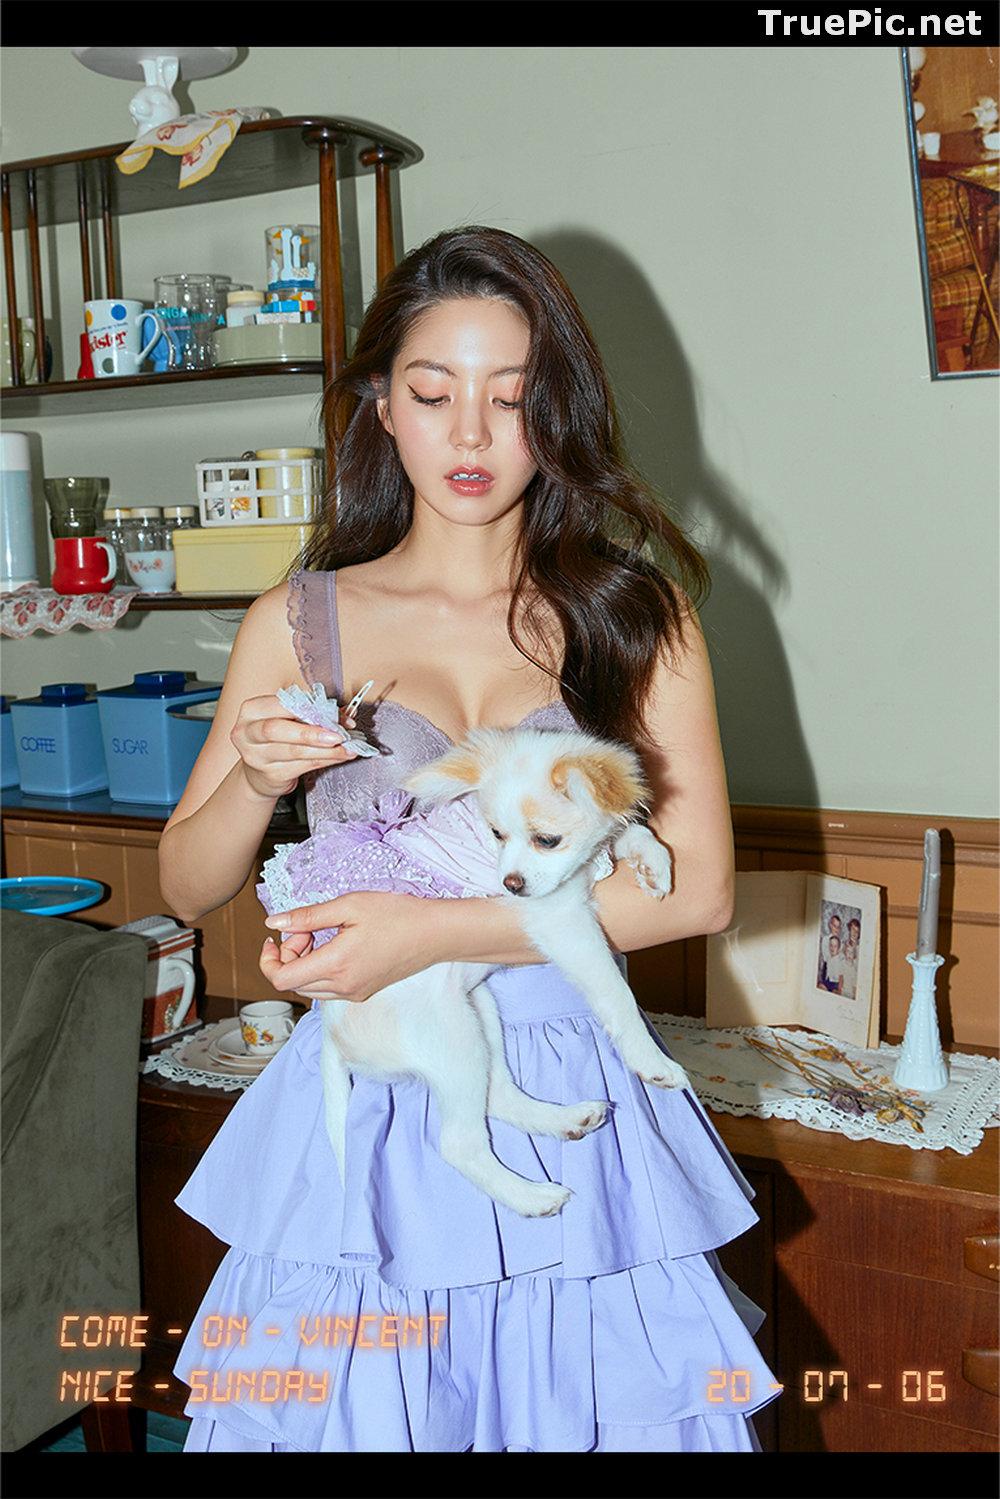 Image Korean Fashion Model – Lee Chae Eun (이채은) – Come On Vincent Lingerie #3 - TruePic.net - Picture-6